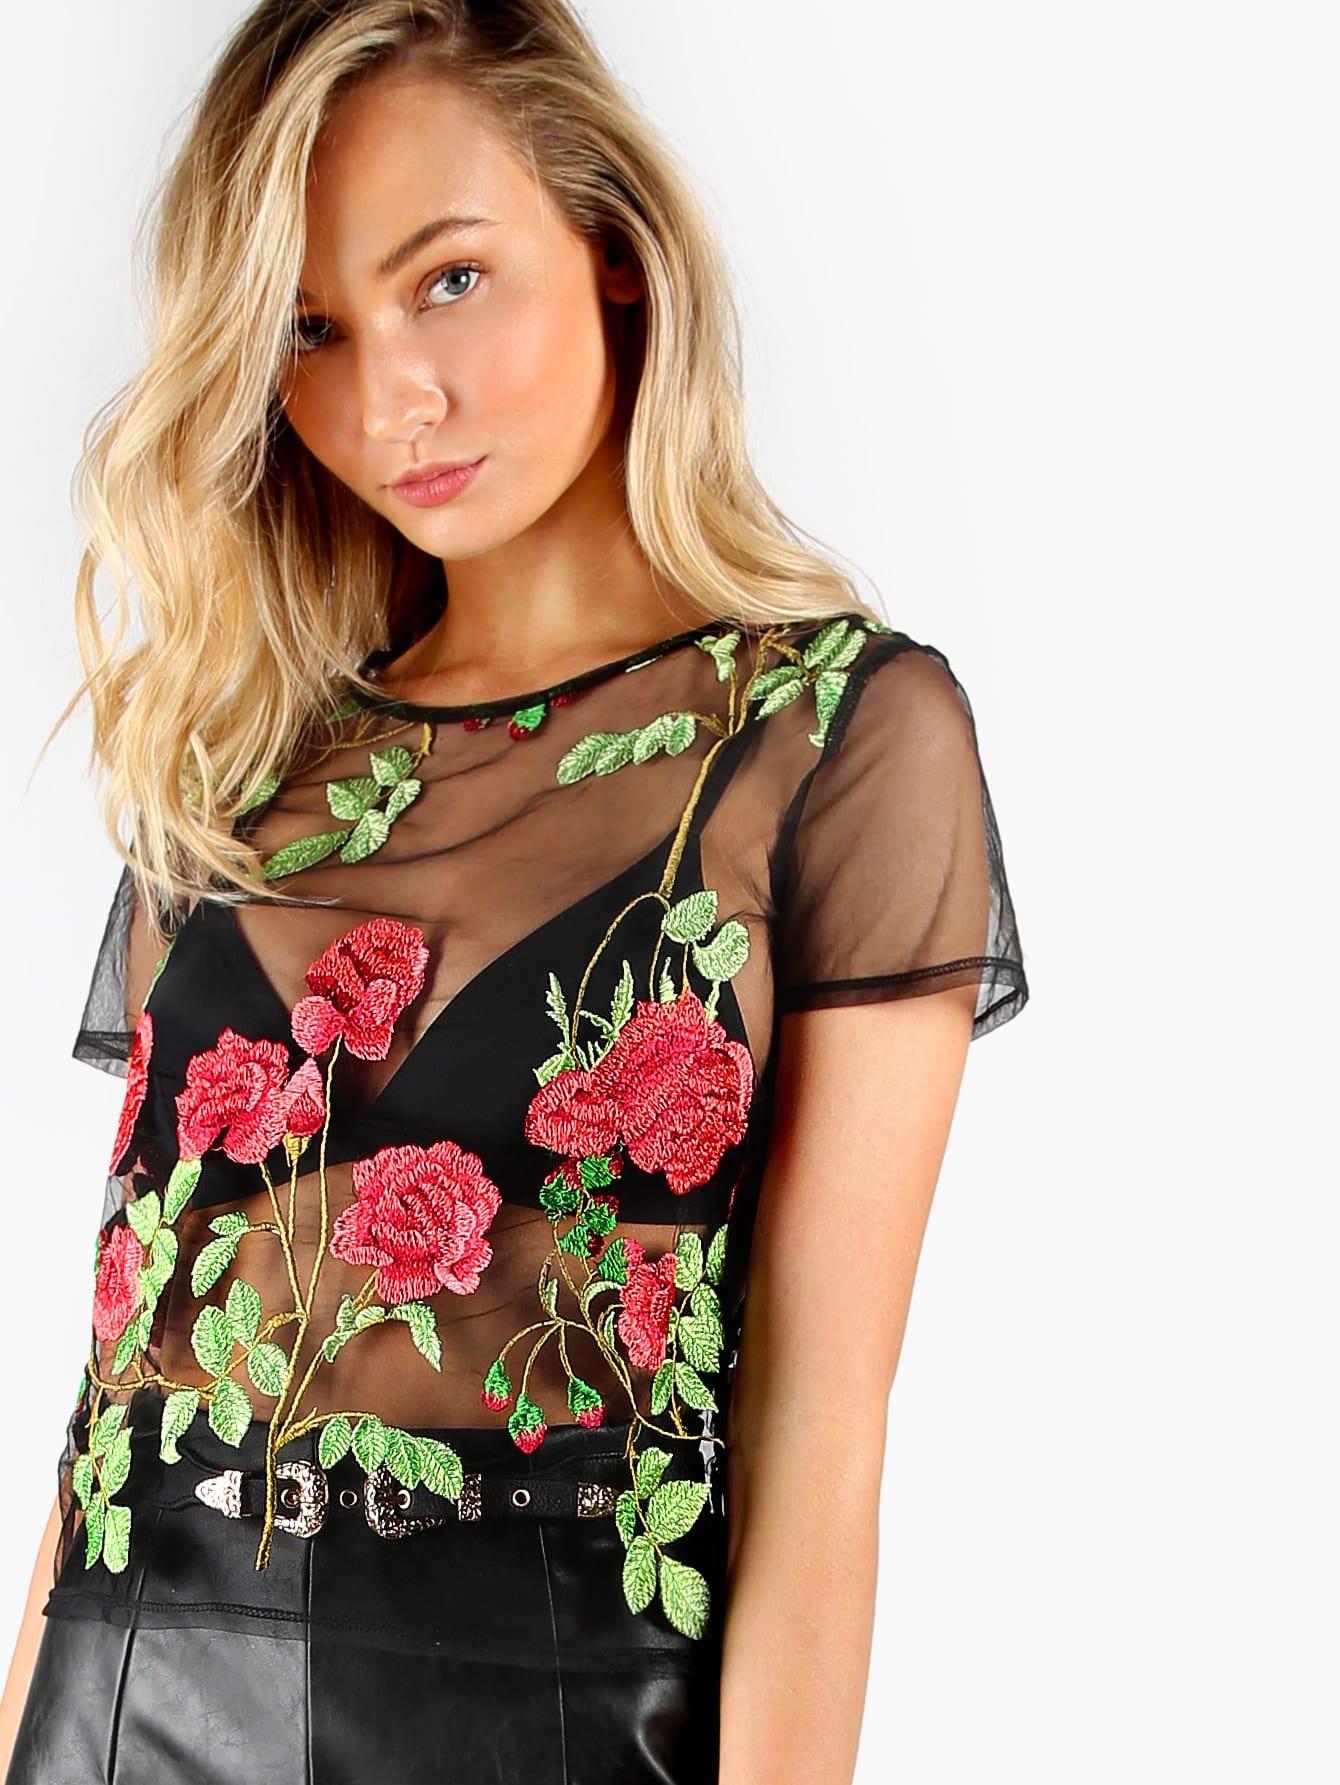 Rose Embroidered Sheer Mesh Top blousemmc170328701